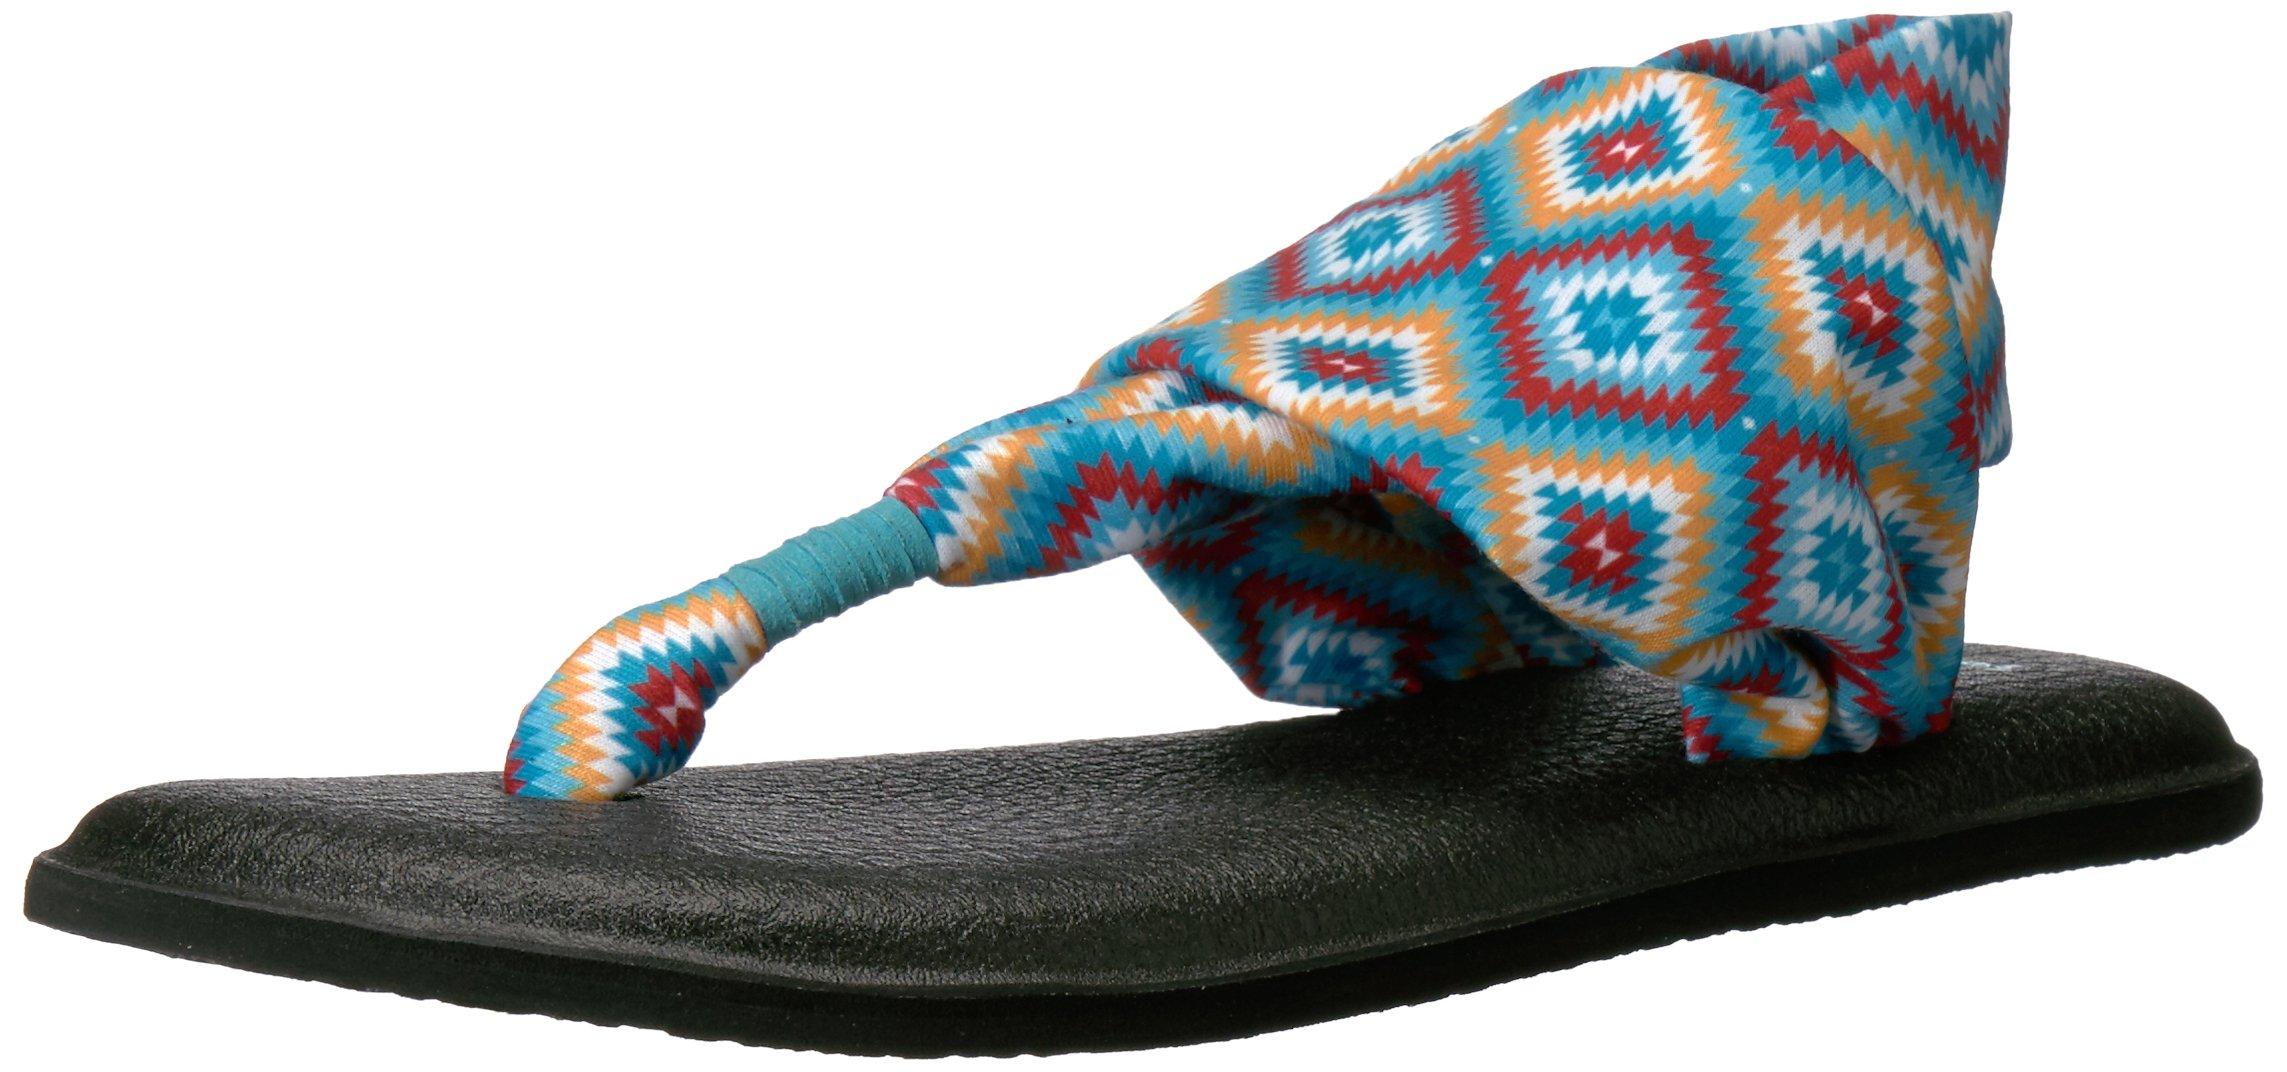 Sanuk Women's Yoga Sling 2 Prints Flip Flop, The Ranch Aqua, 8 M US